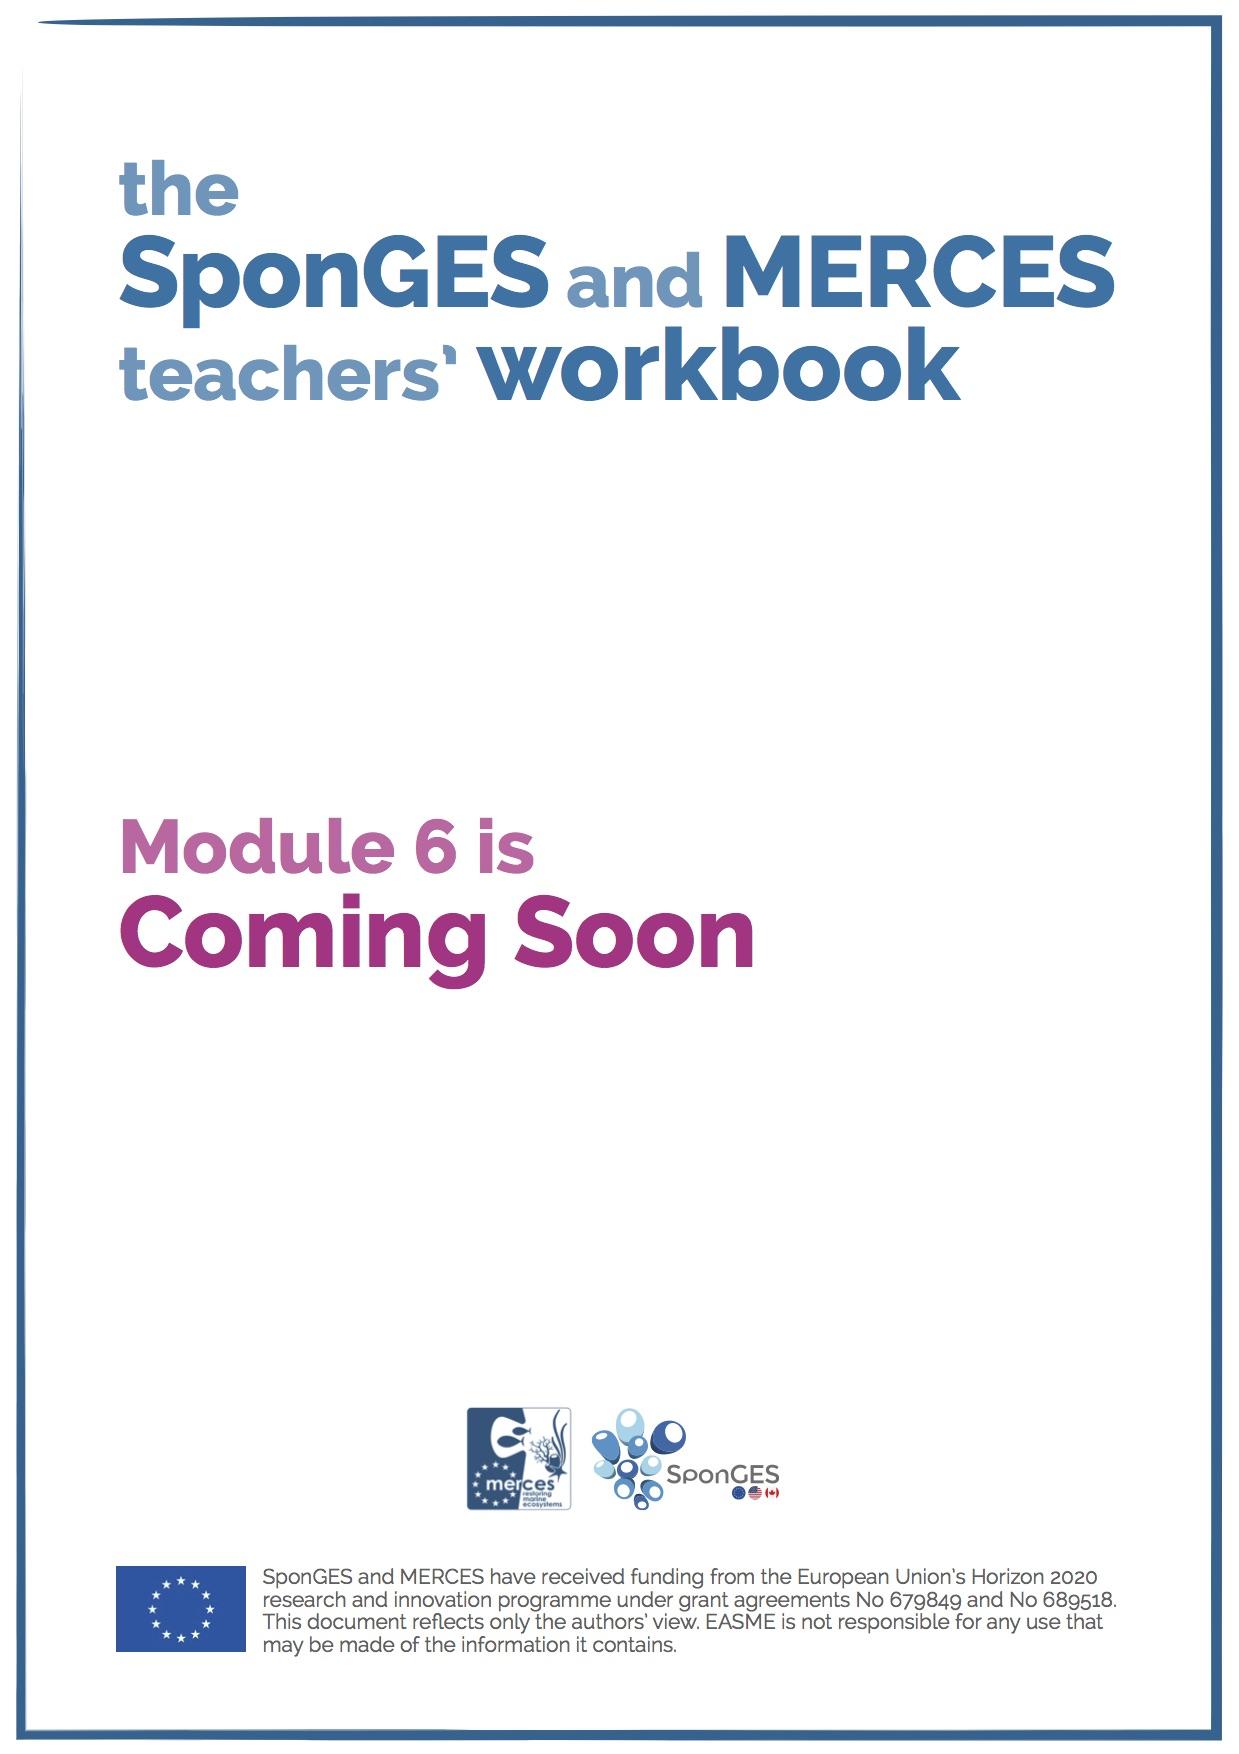 Module 6 of the SponGES and MERCES teachers' workbook